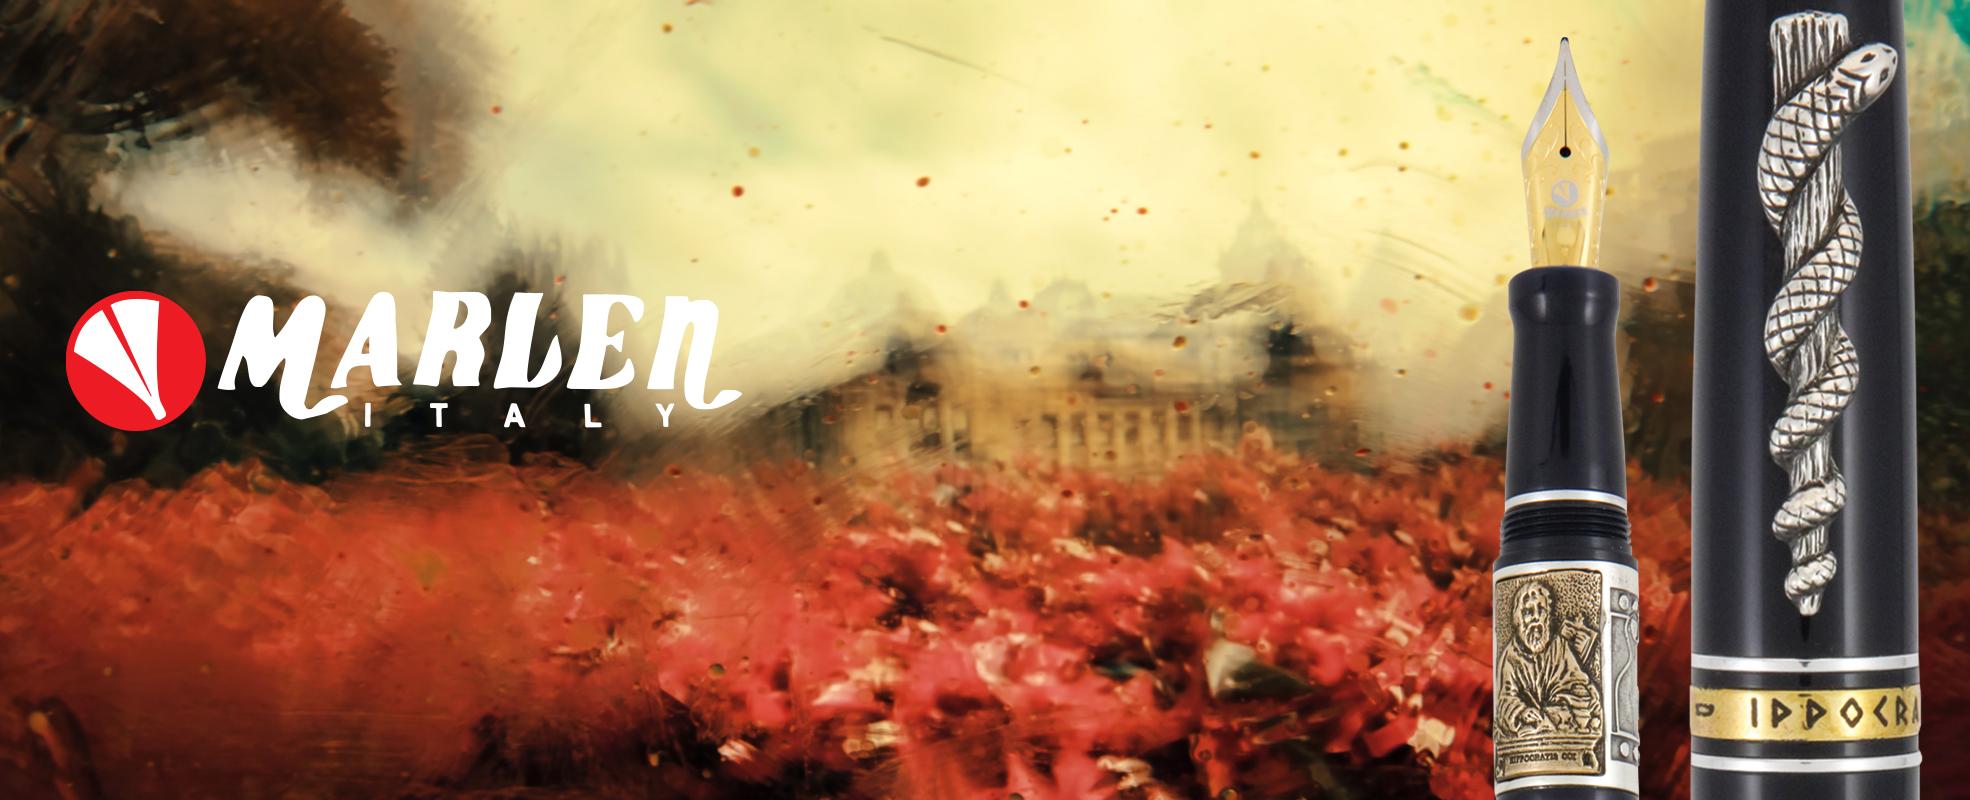 marlen-banner-new.jpg